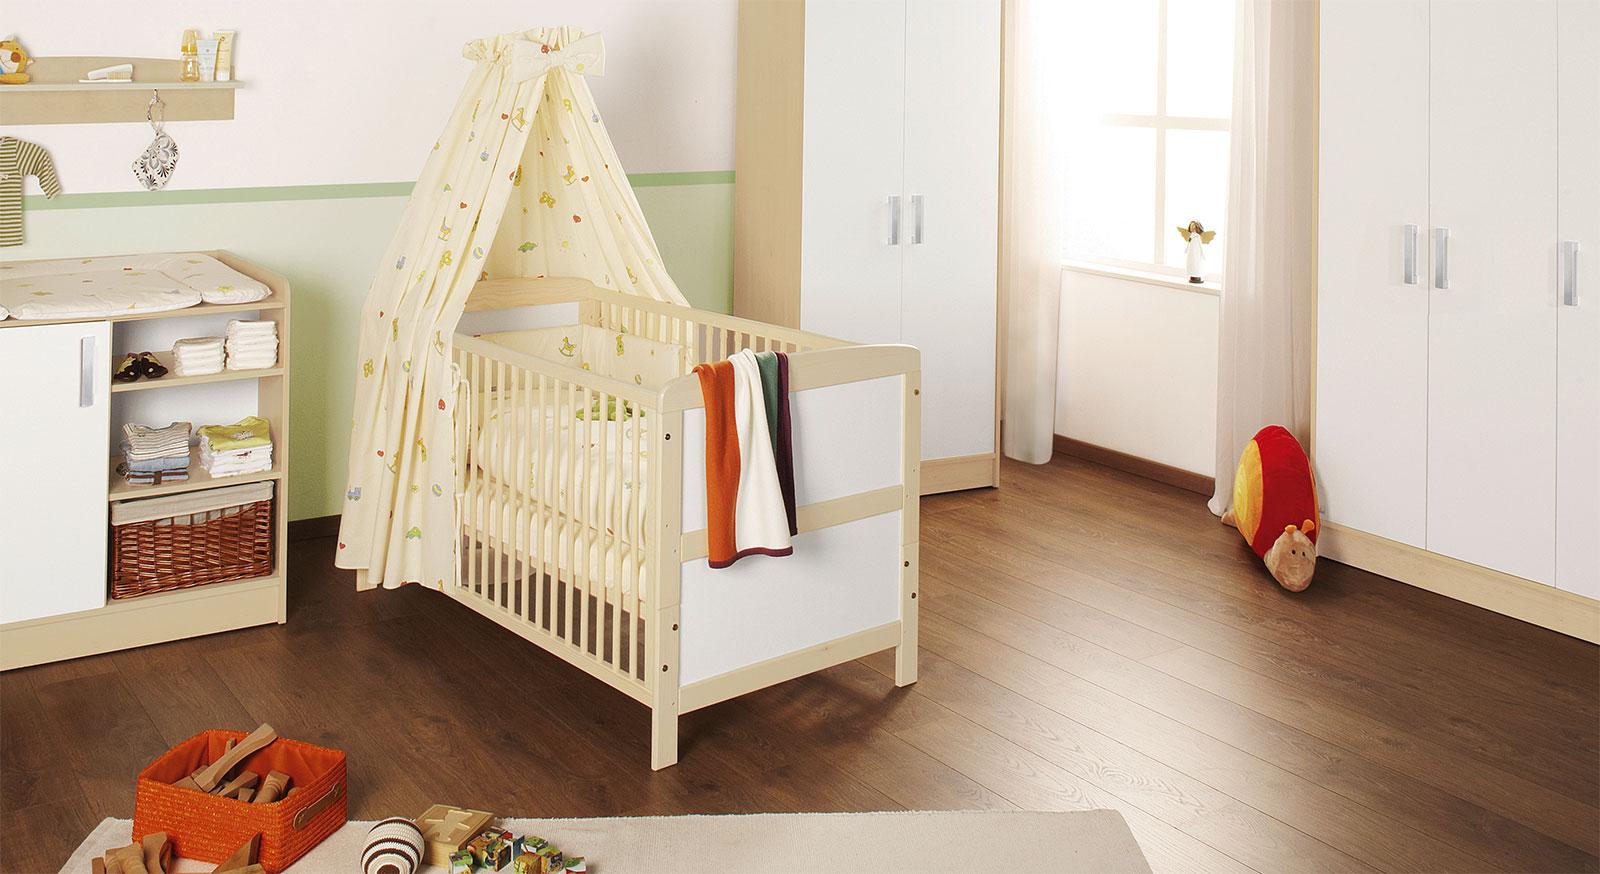 Kinderbett Gitterbett Henri mit effektivem Umbau-Set